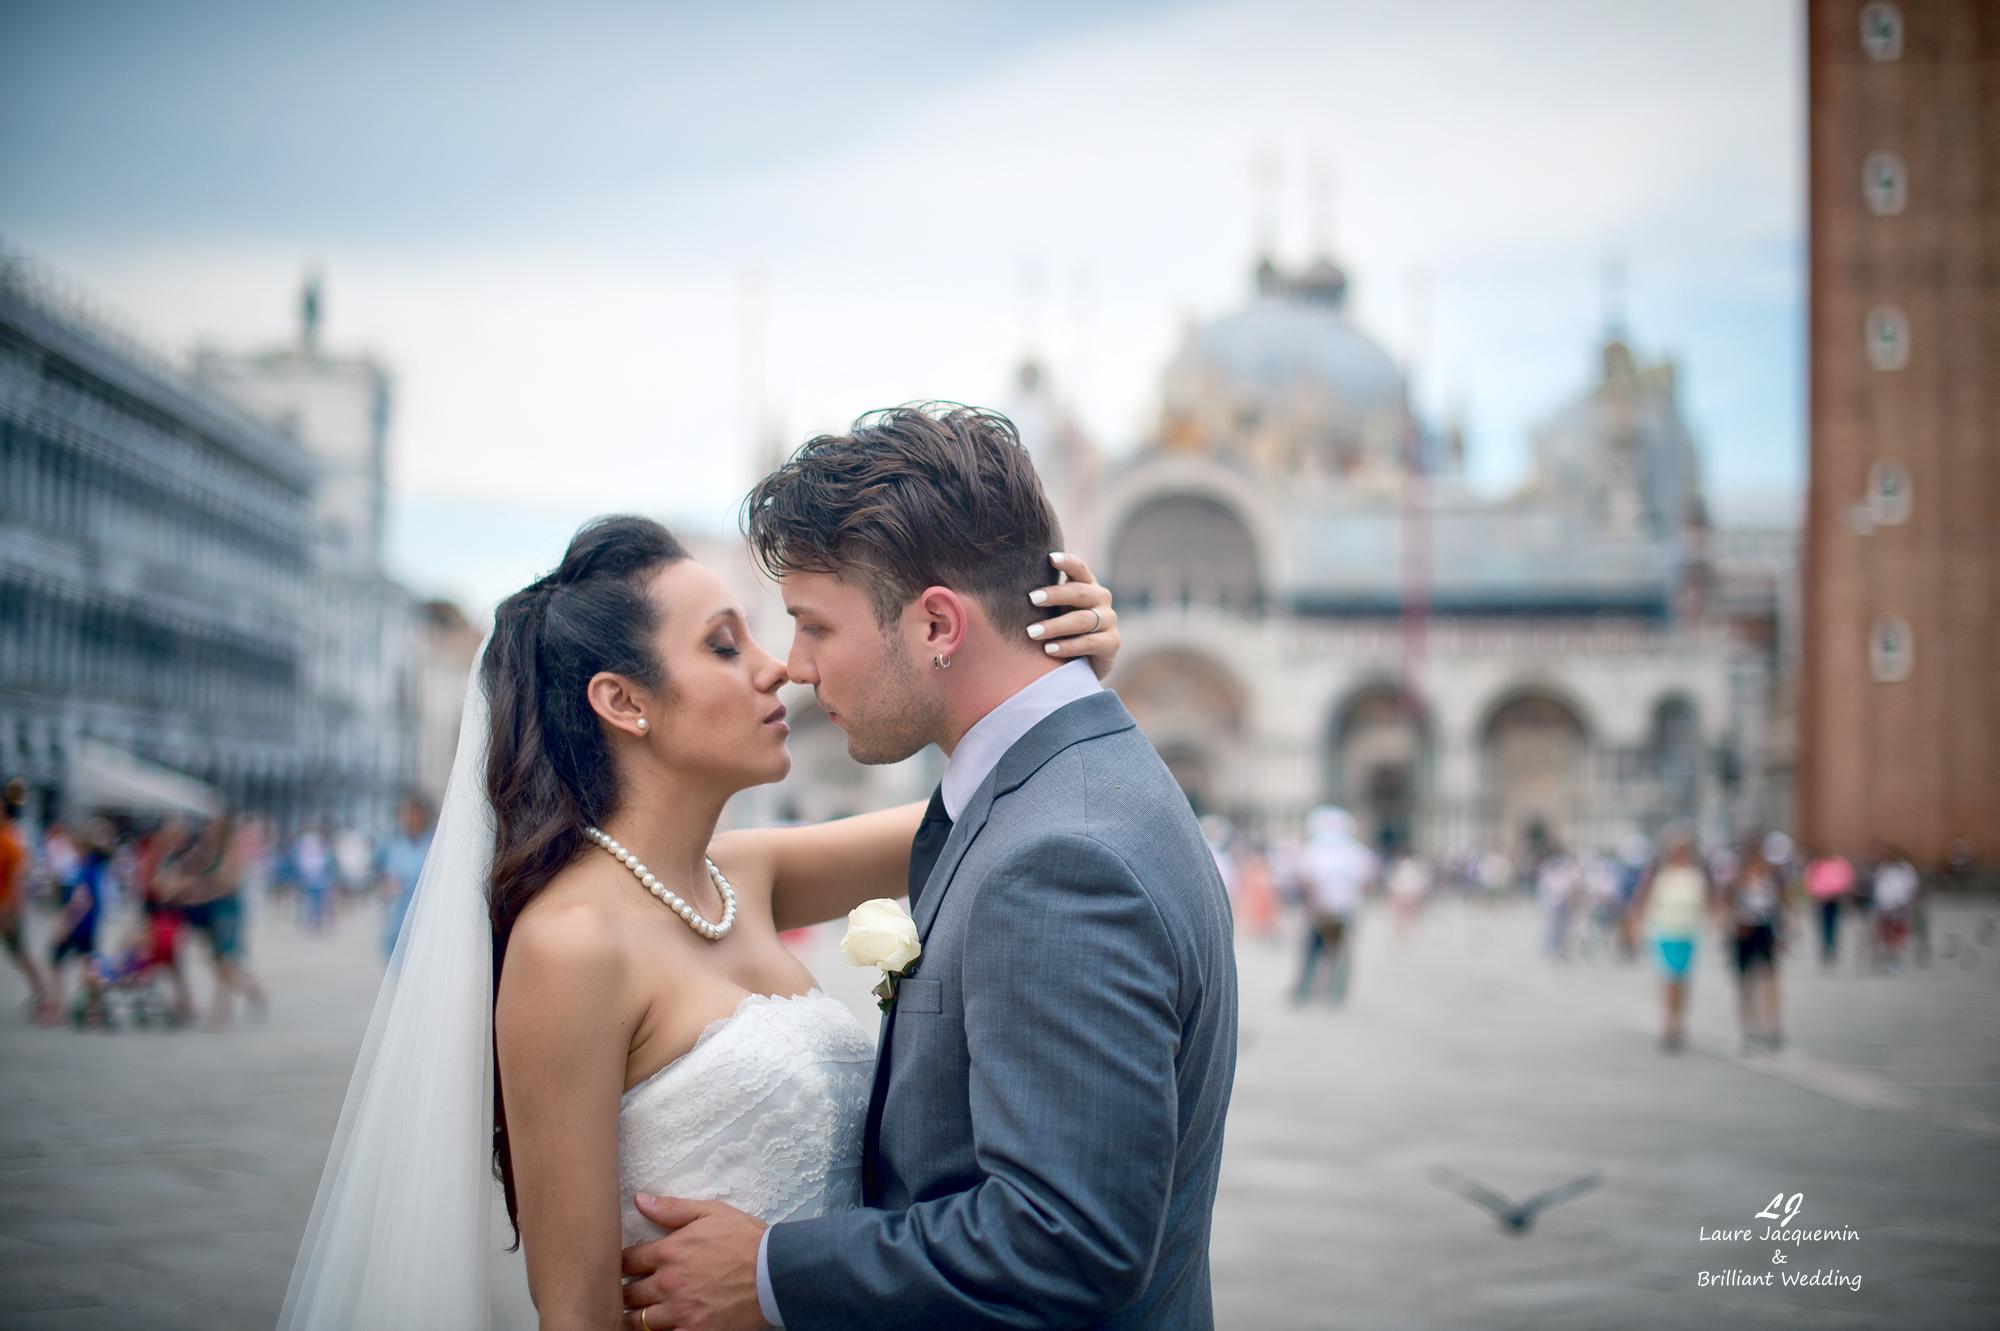 Venice Simbolic Wedding gondola venice Italy laure jacquemin photography (90) copia